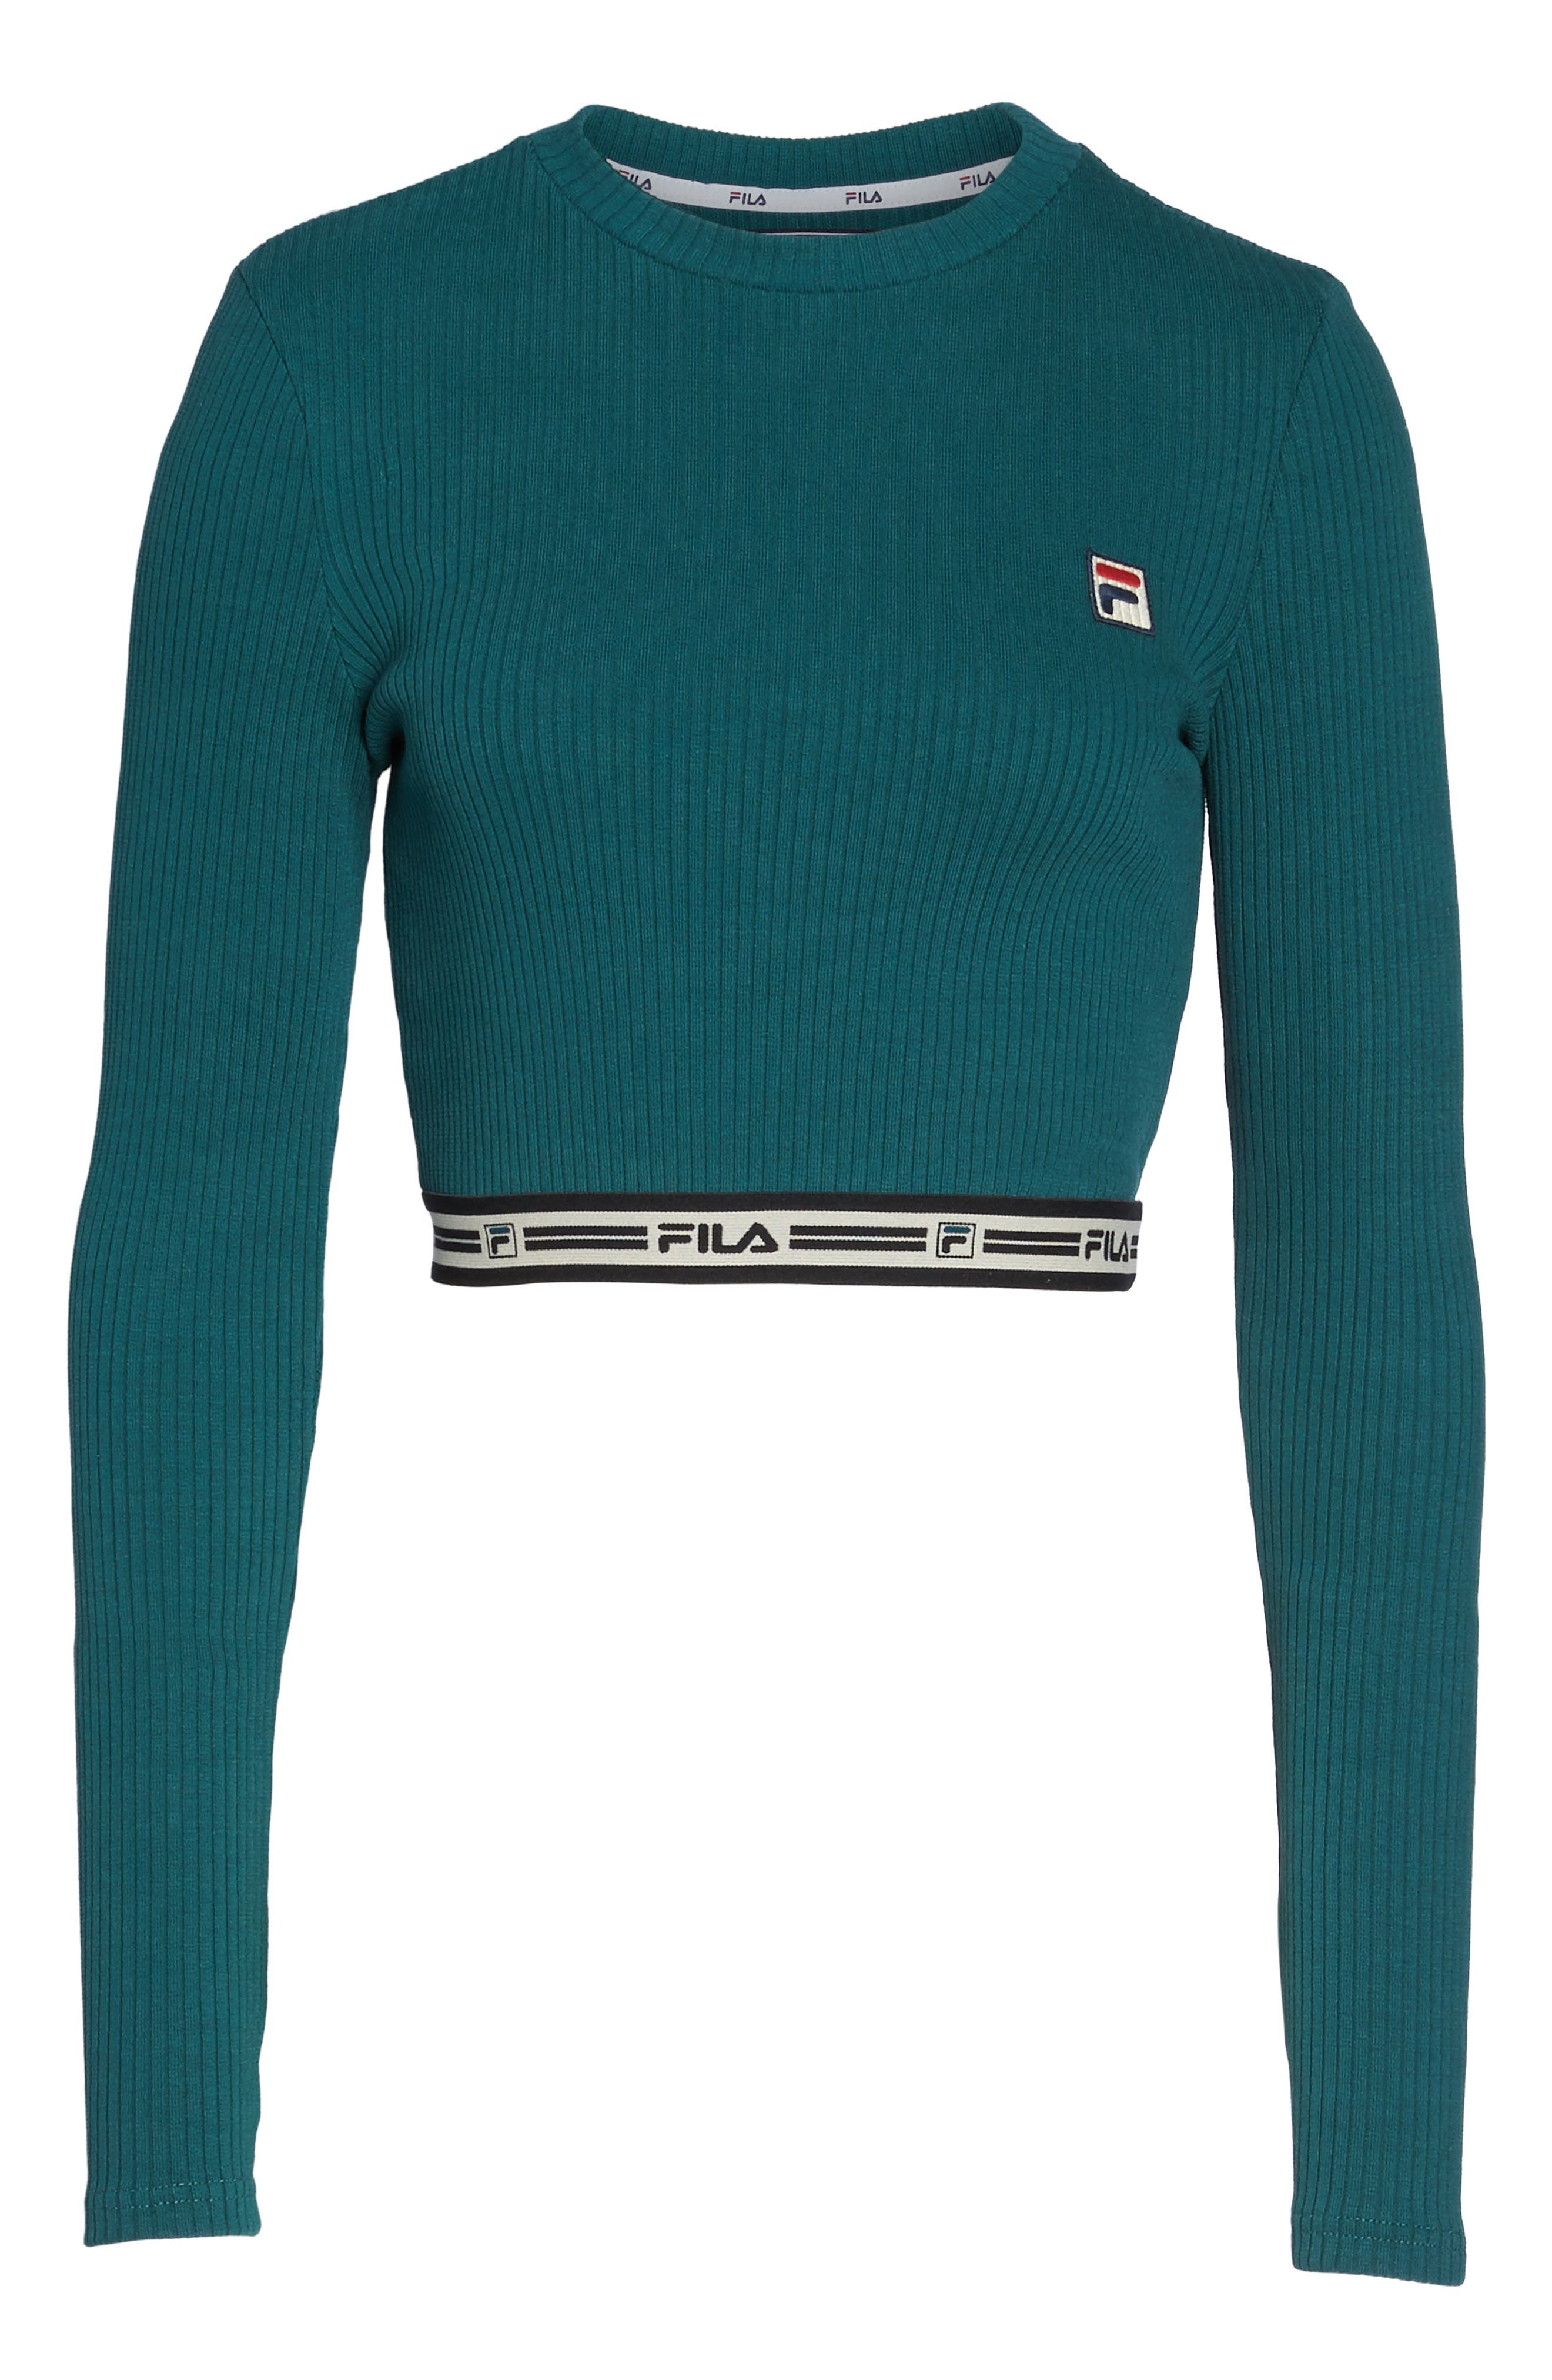 Colleen Long Sleeve Crop Top,                         Main,                         color, Deep Teal/ Gardenia/ Black